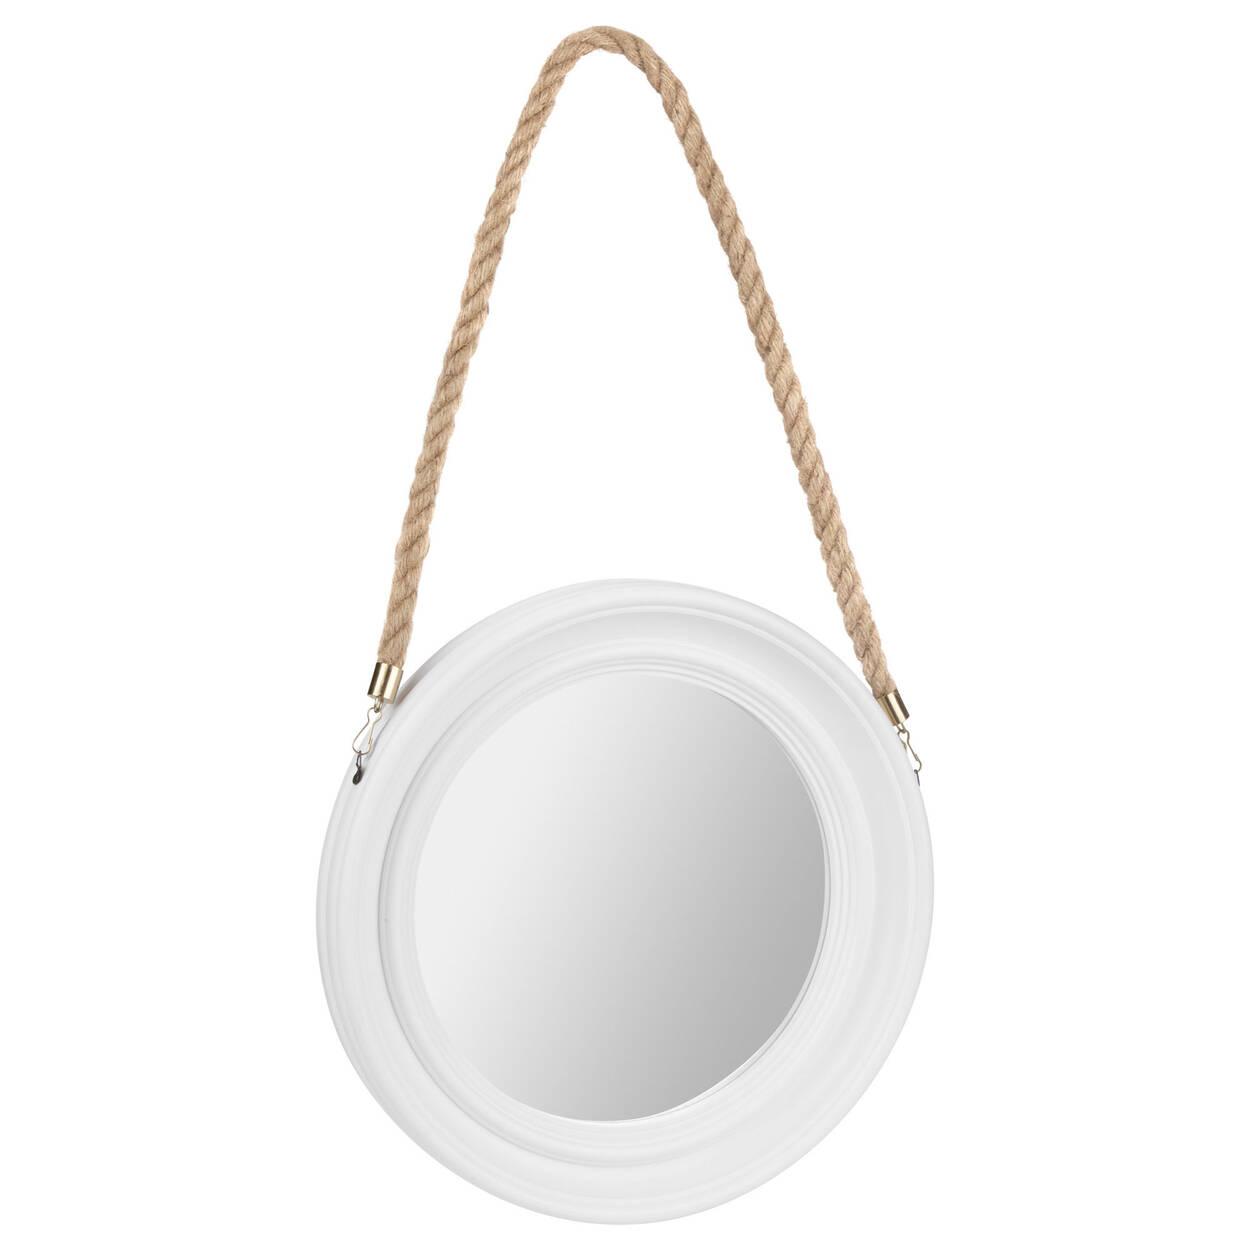 miroir rond avec support en corde